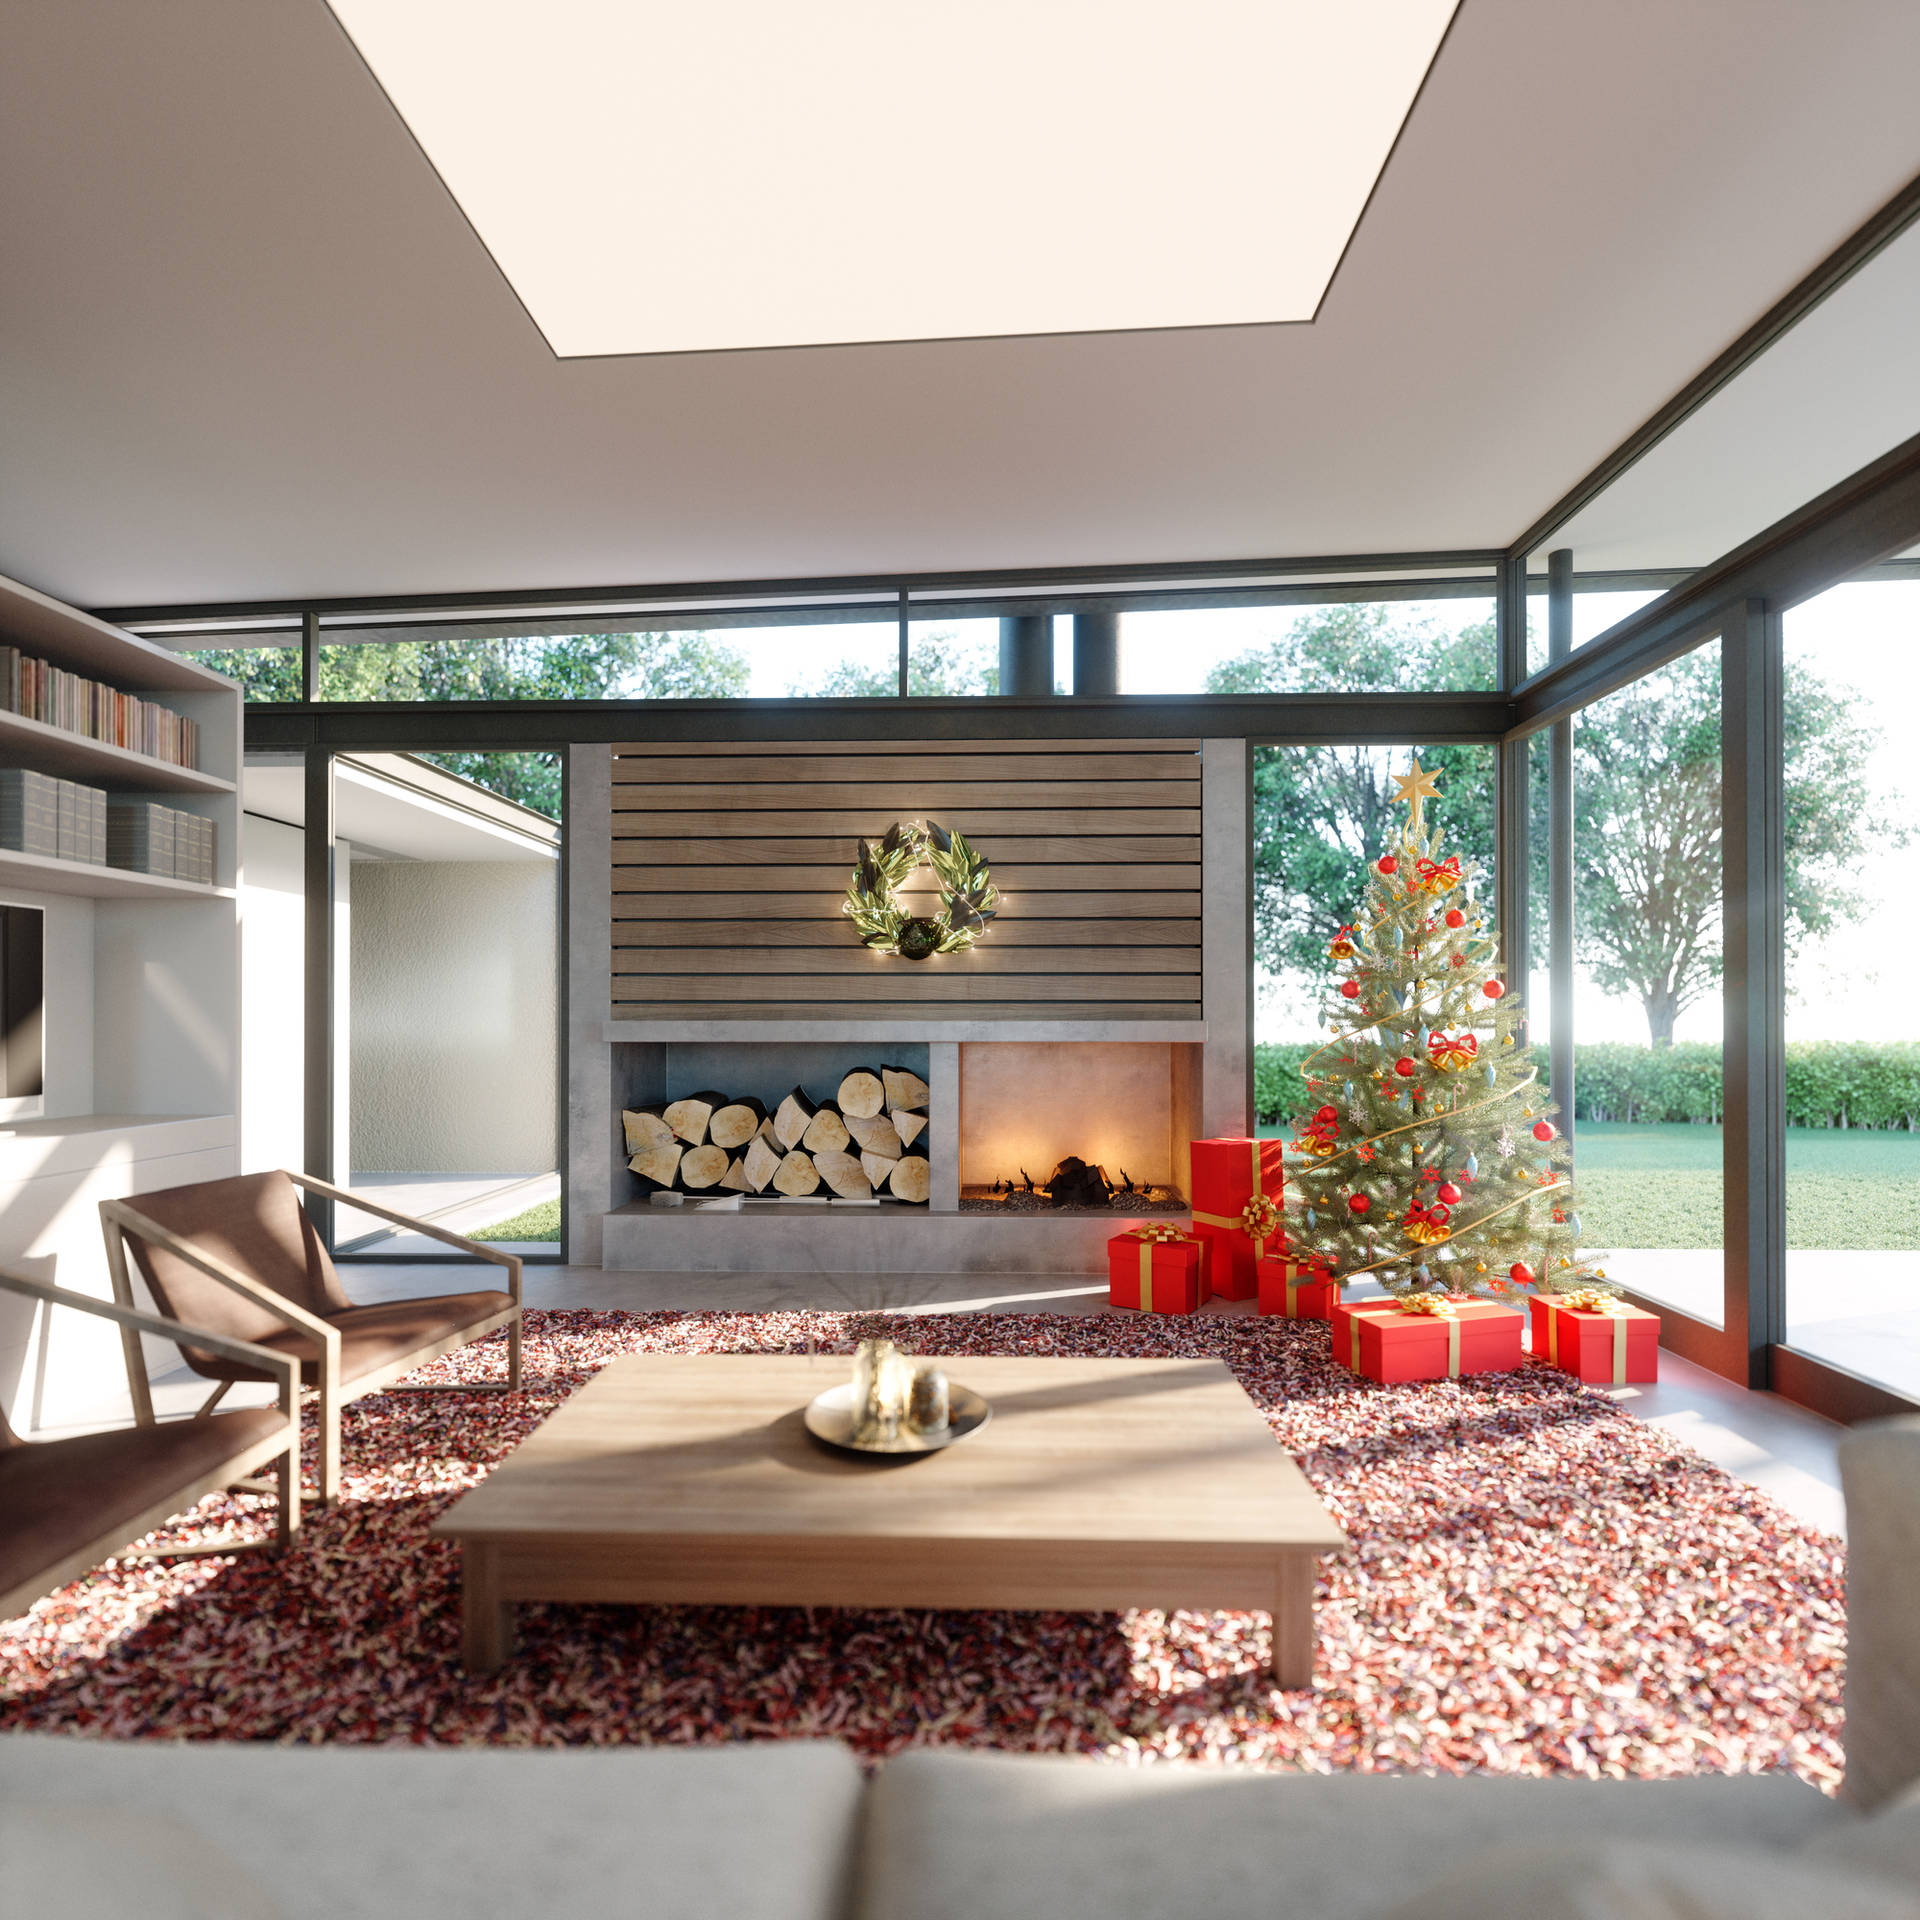 Casa San Isidro - Interior 2